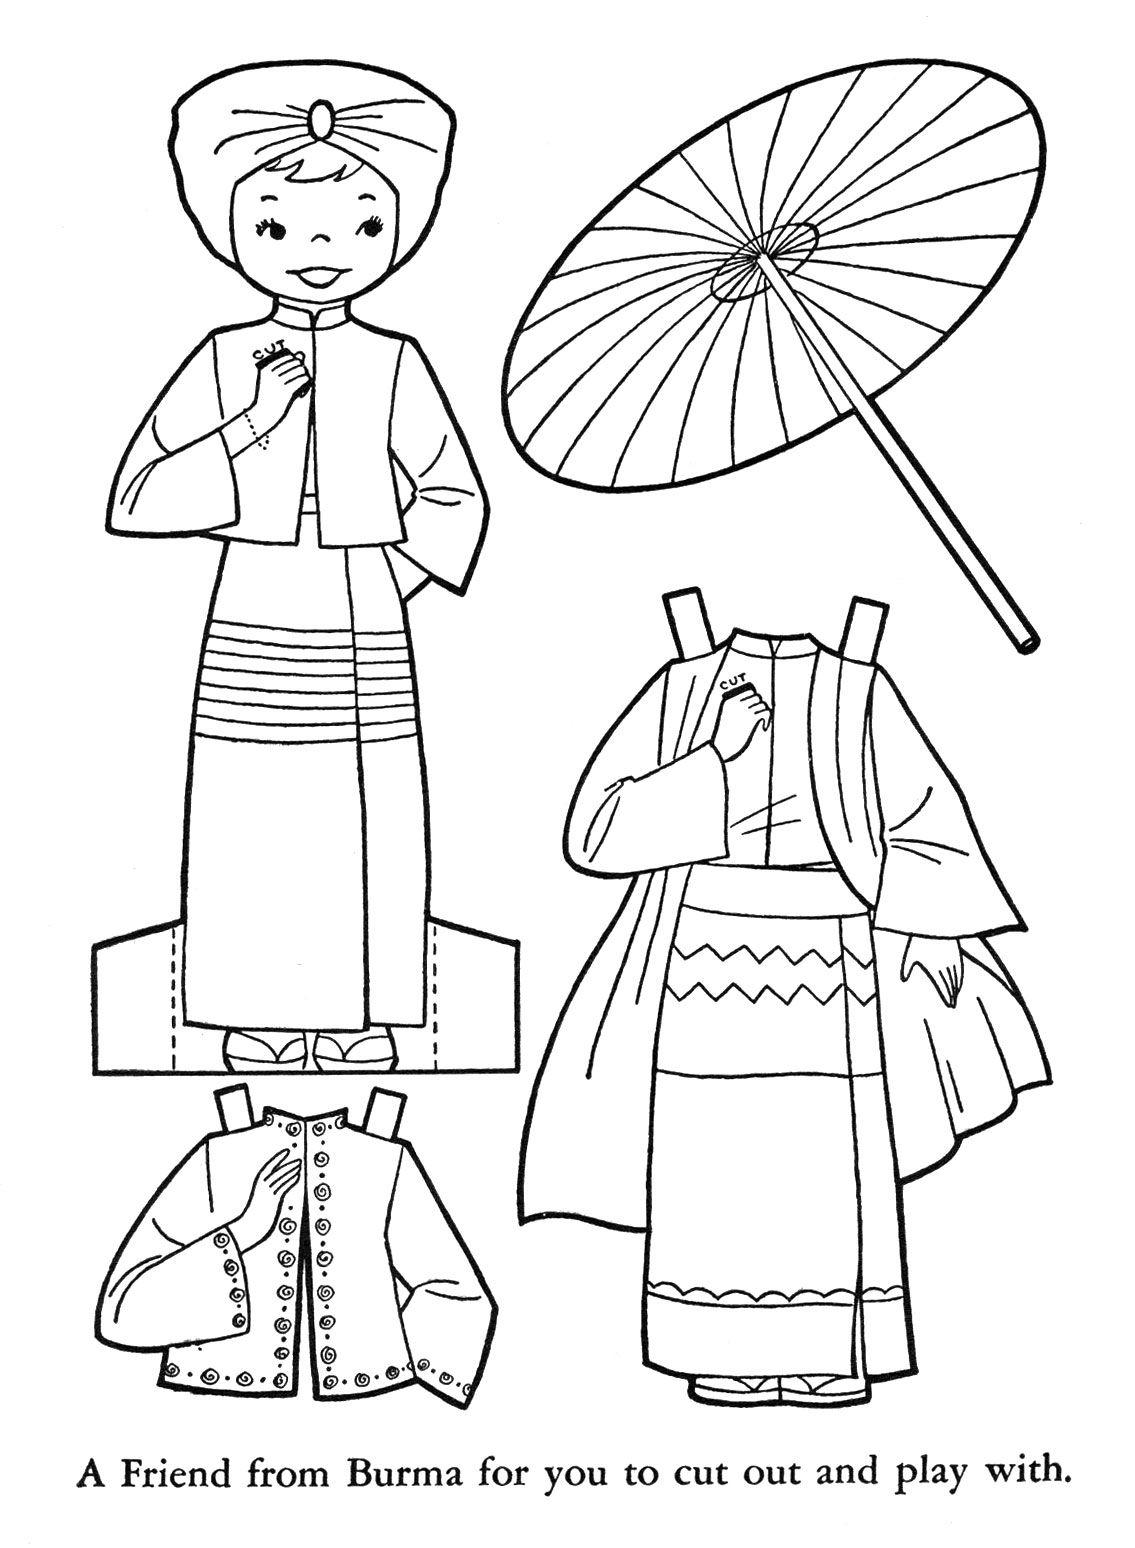 Burma Doll Http Qisforquilter Com Wp Content Uploads 2012 11